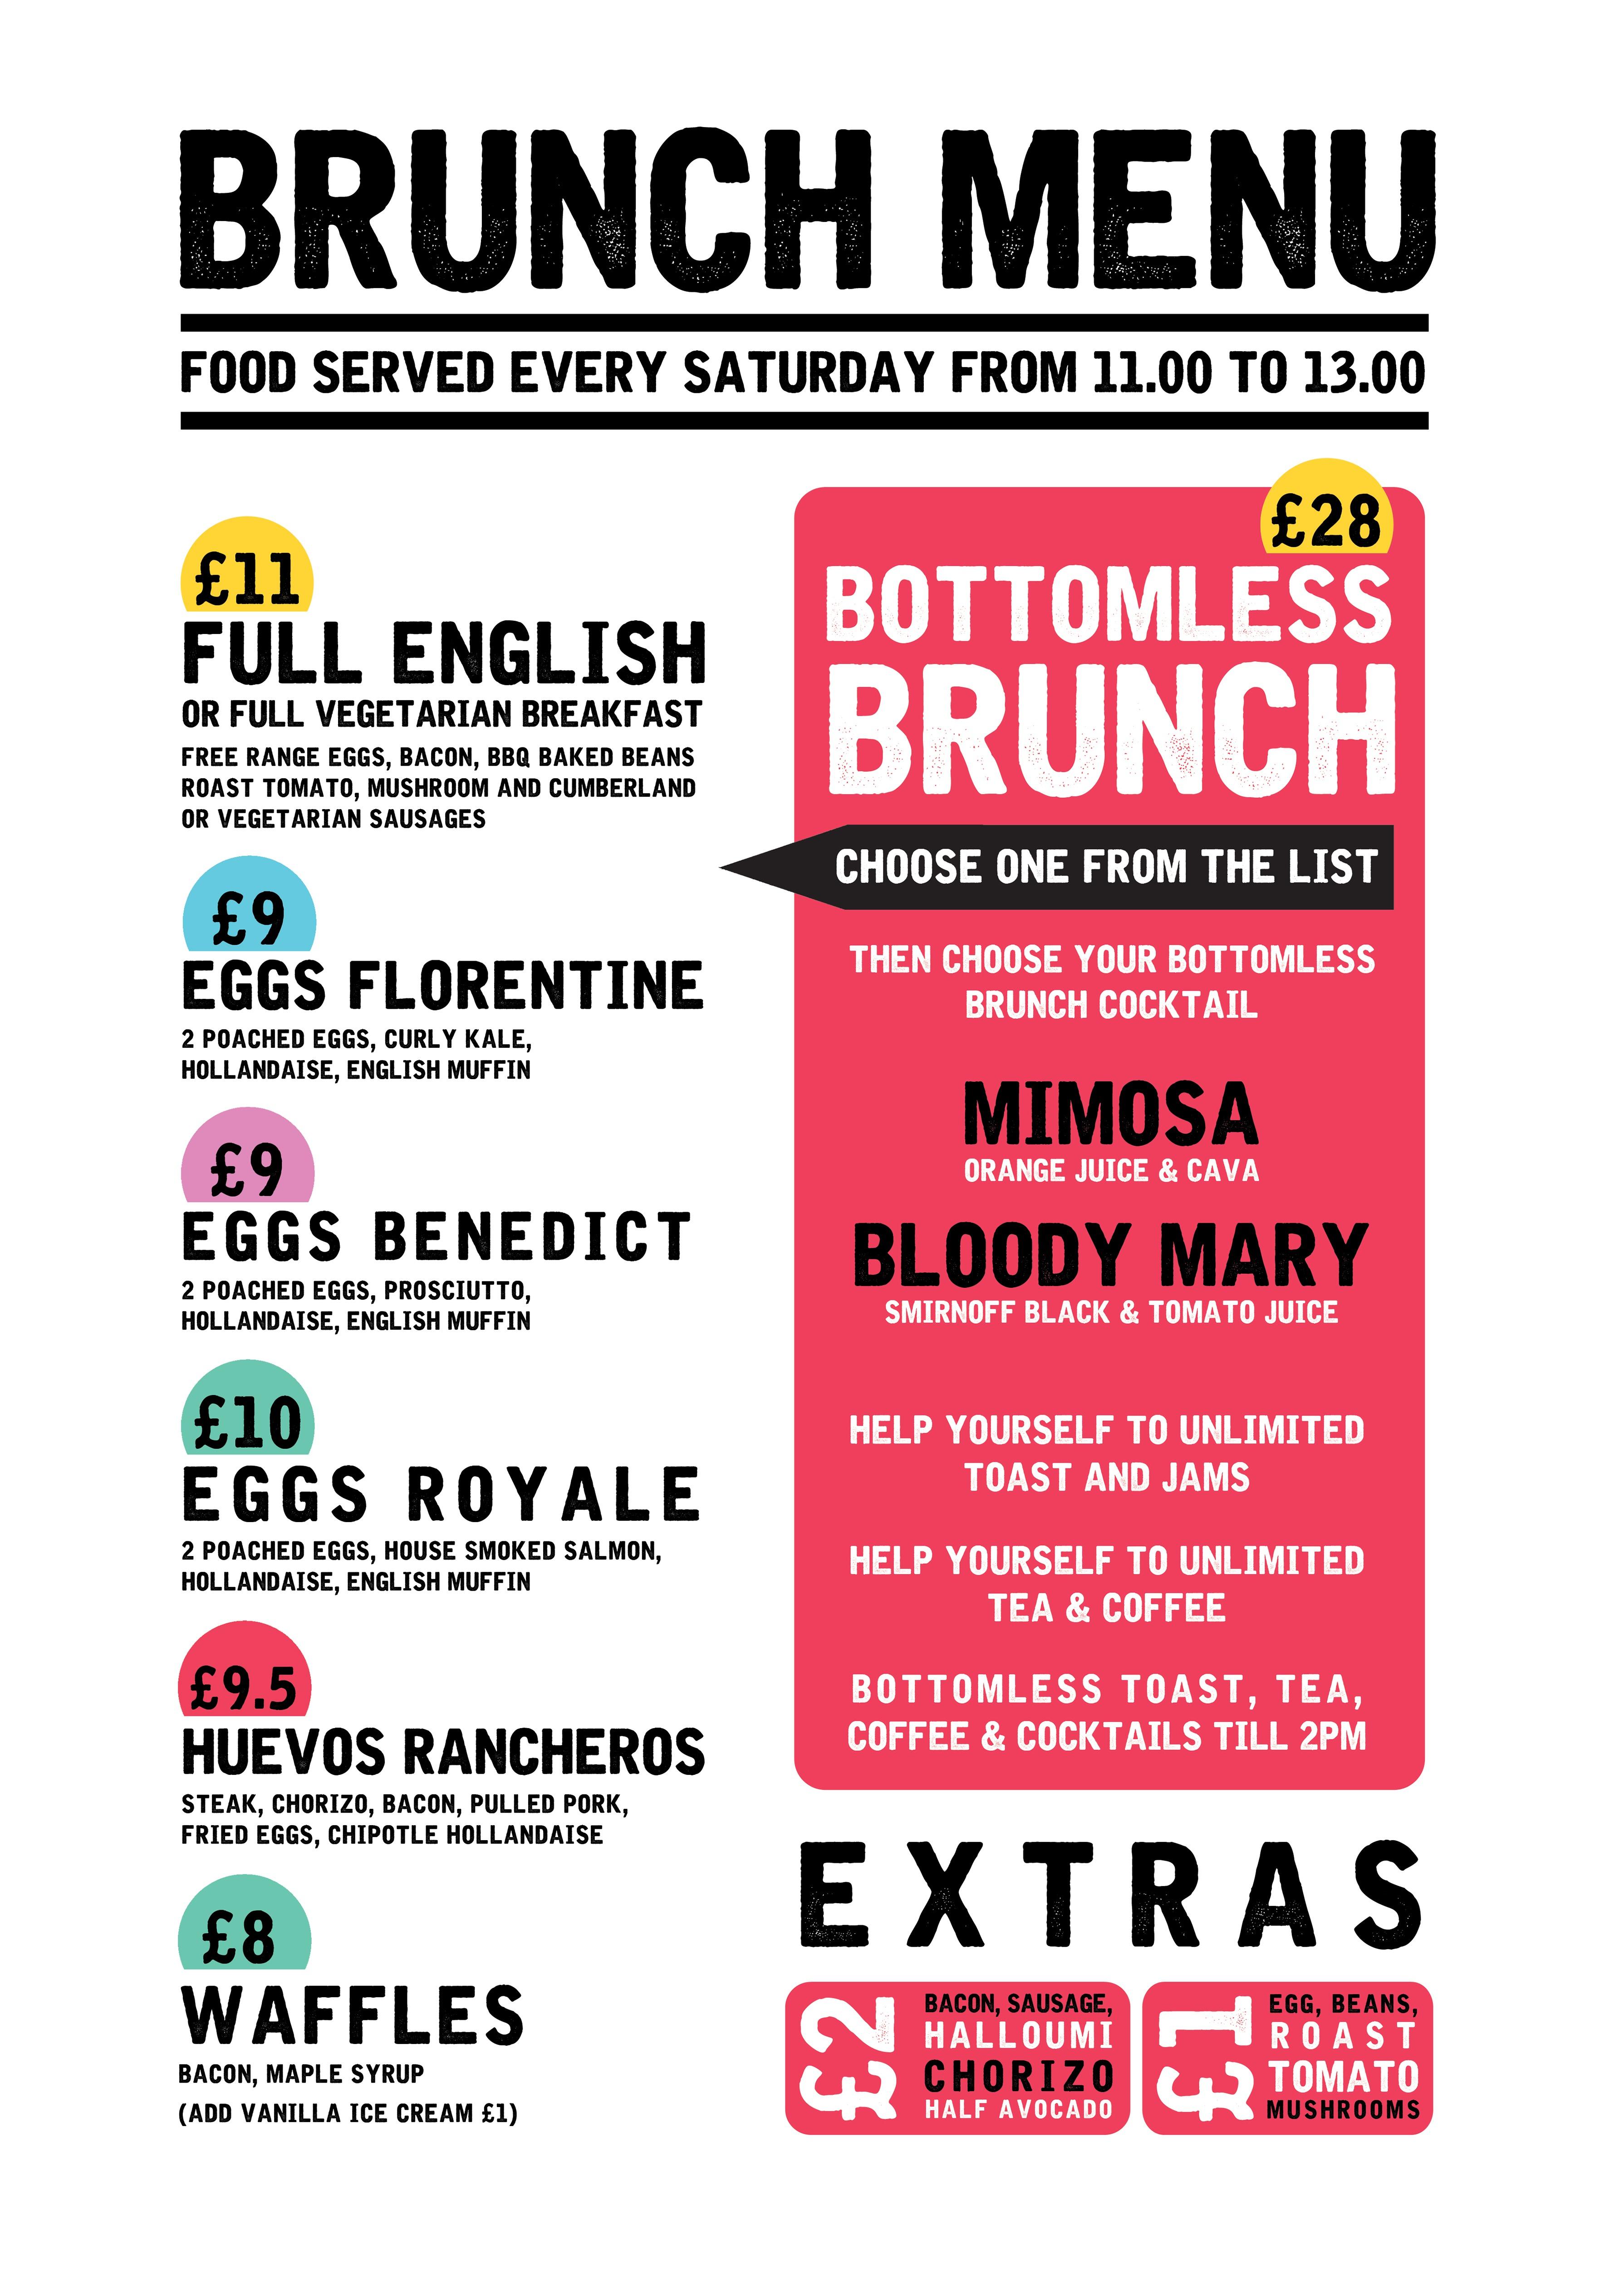 Boozy Bottomless Bingo Brunch People S Park Tavern London